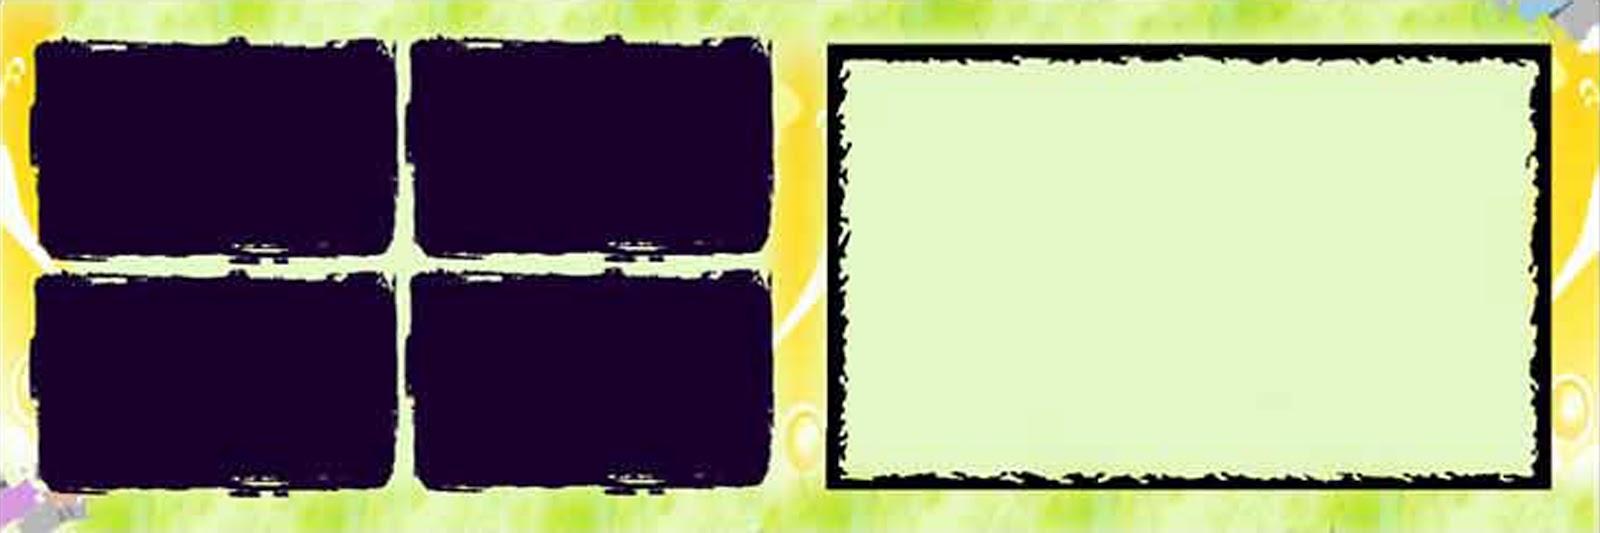 Karizma album hd joy studio design gallery best design - Thursday July 26 2012